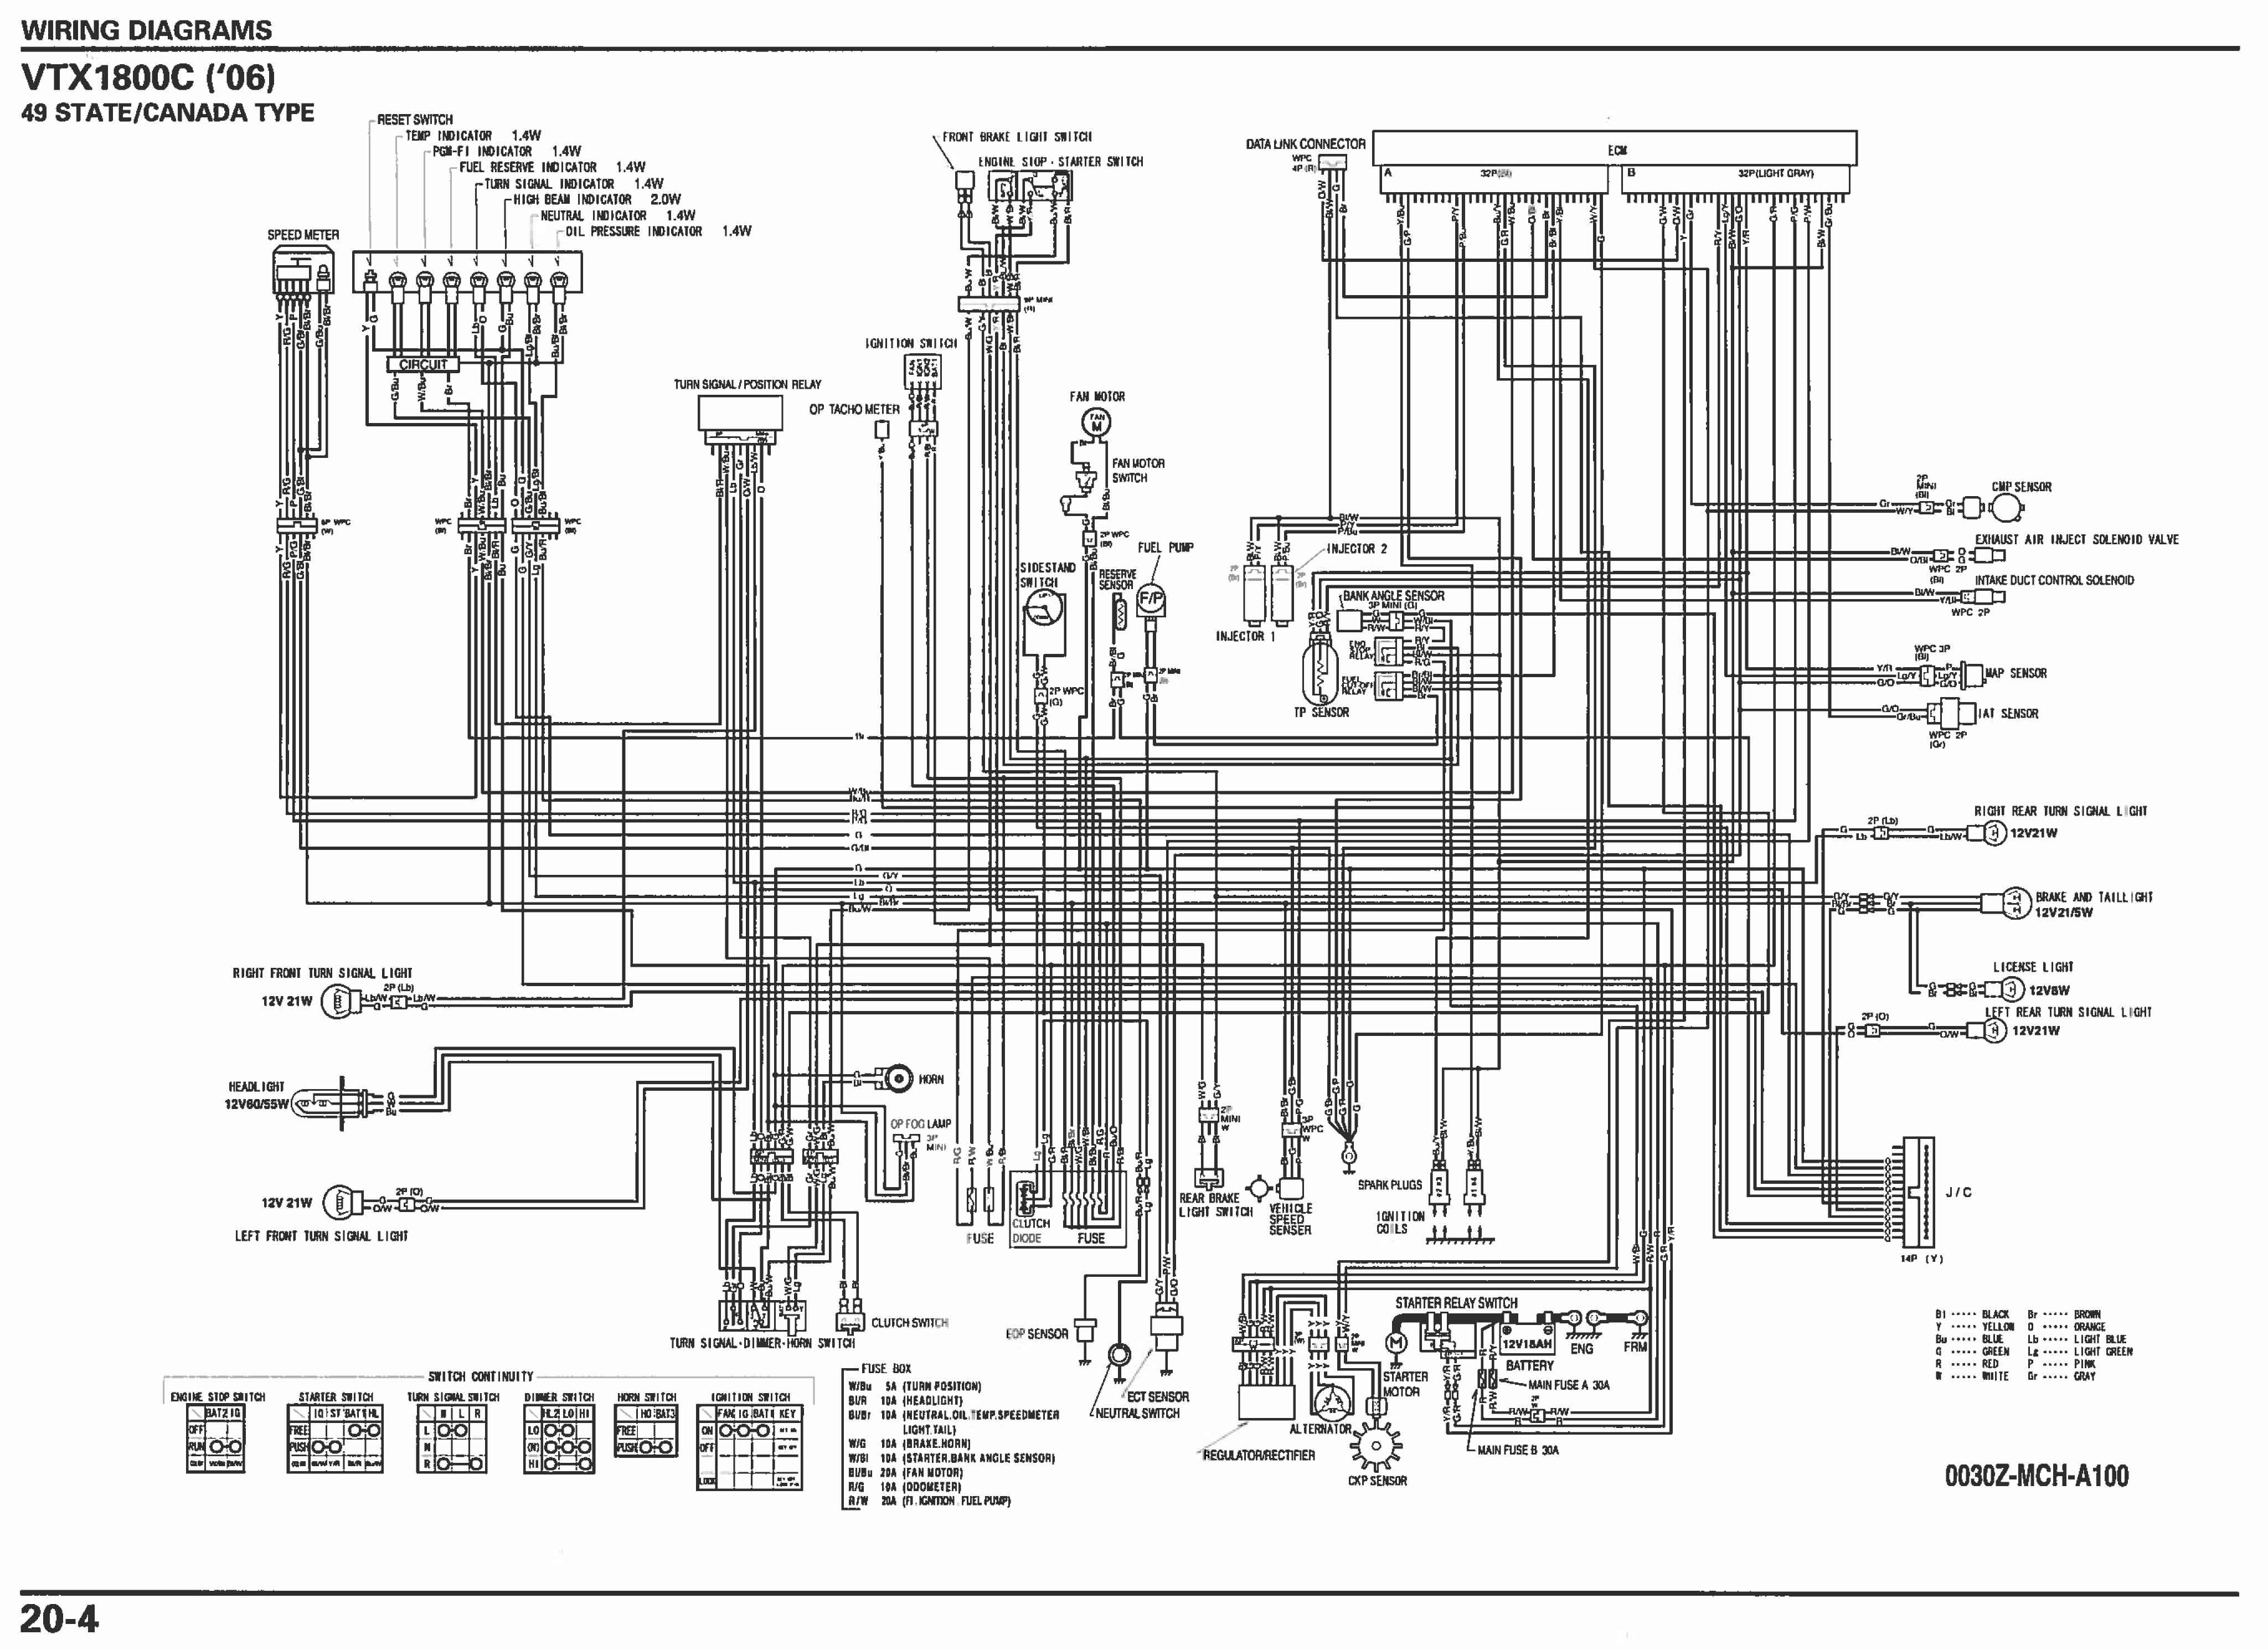 1973 Tr6 Wiring Diagram Schematics 76 Triumph 1974 Wire Diagrams